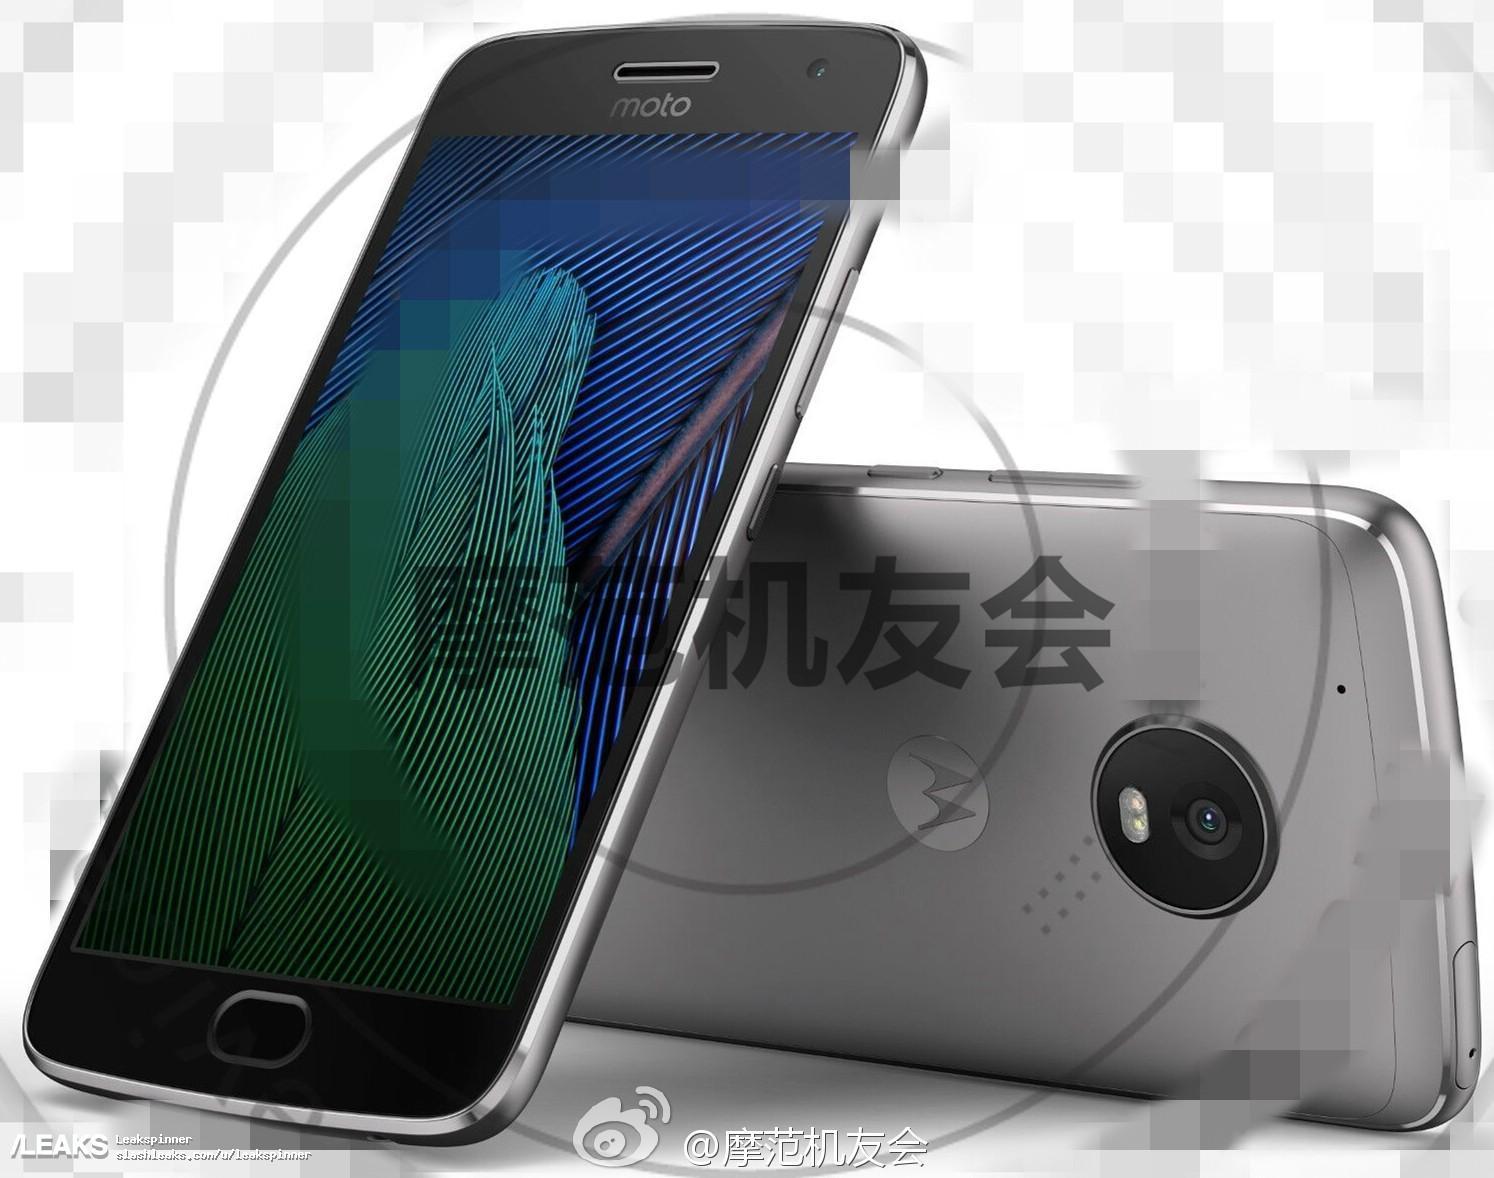 img Moto G5 Plus press render leaks out